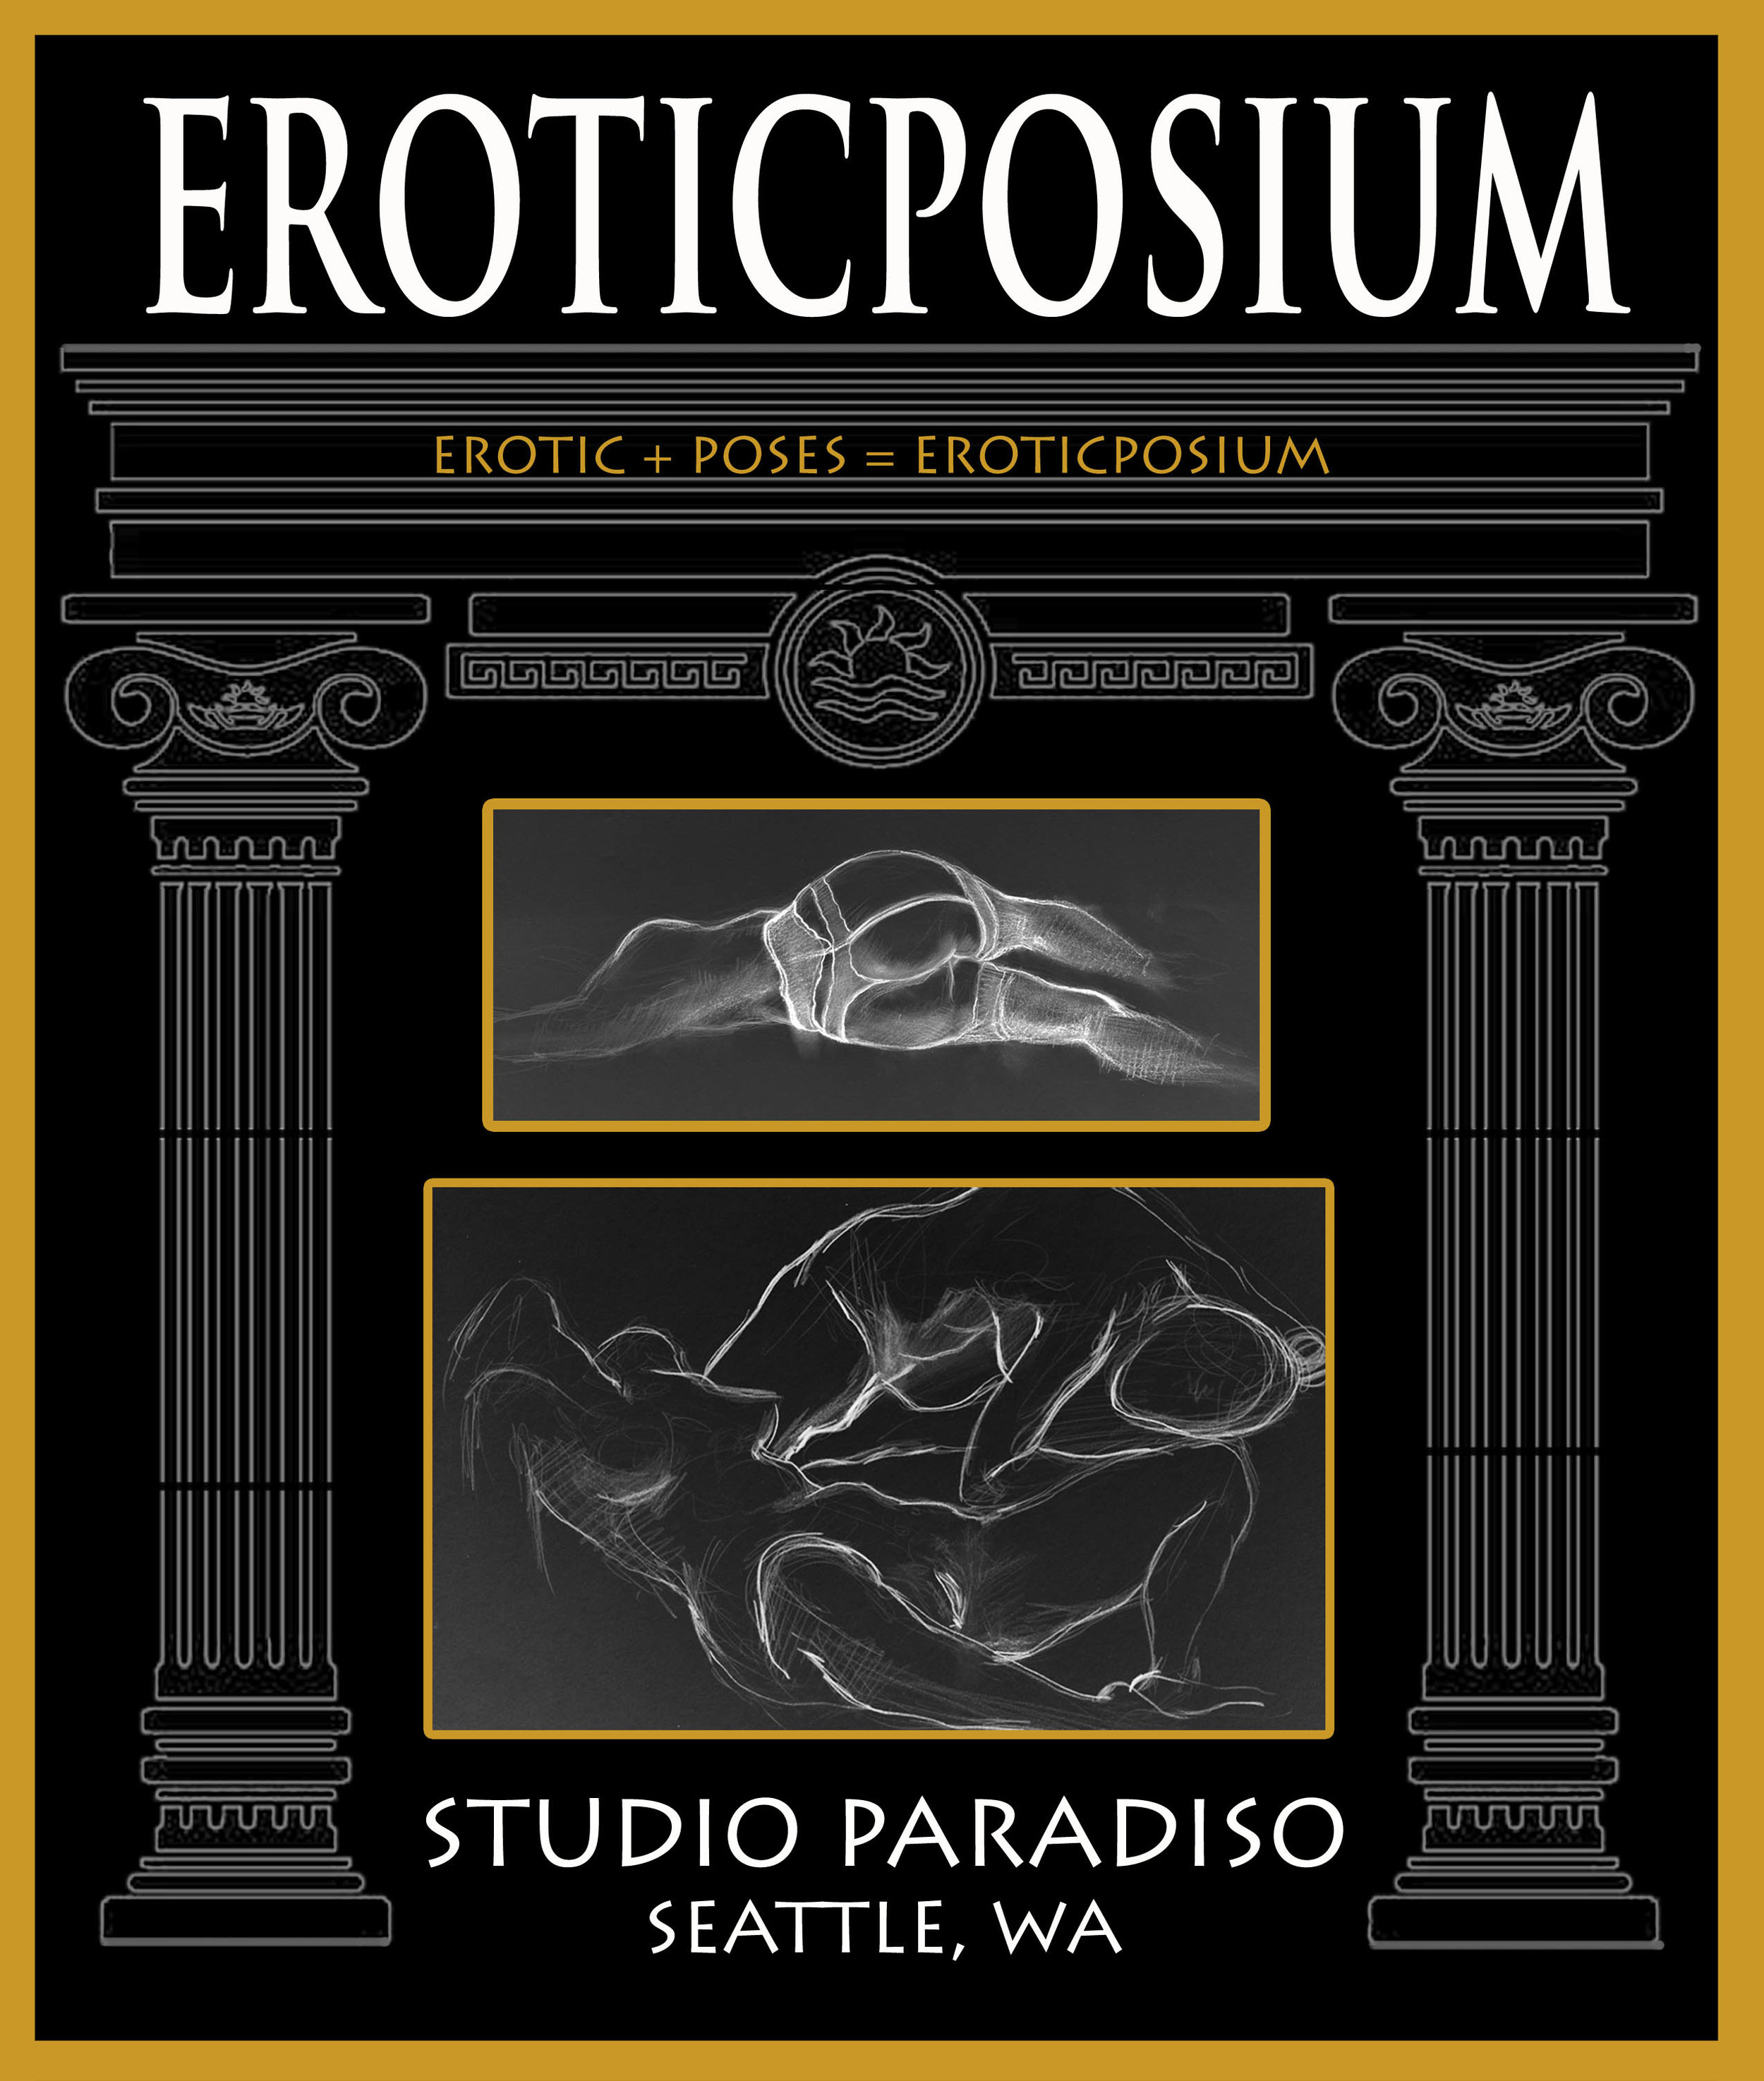 eroticposiumT2.jpg